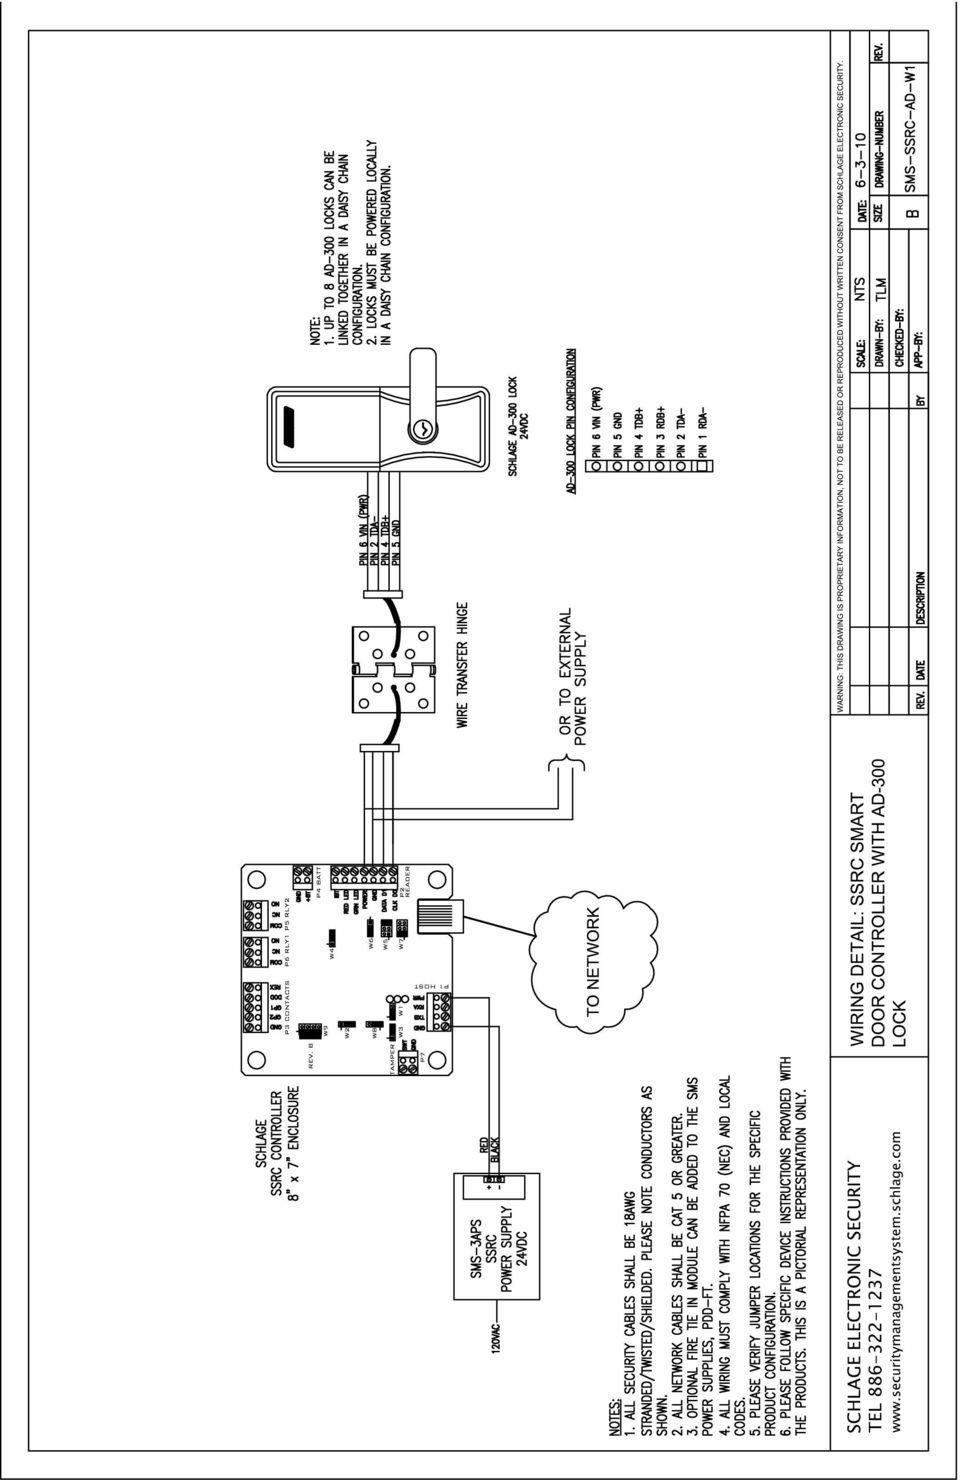 Schlage Nd80pdeu Wiring Diagram Elixir Converter Wiring Diagram Free Picture Begeboy Wiring Diagram Source